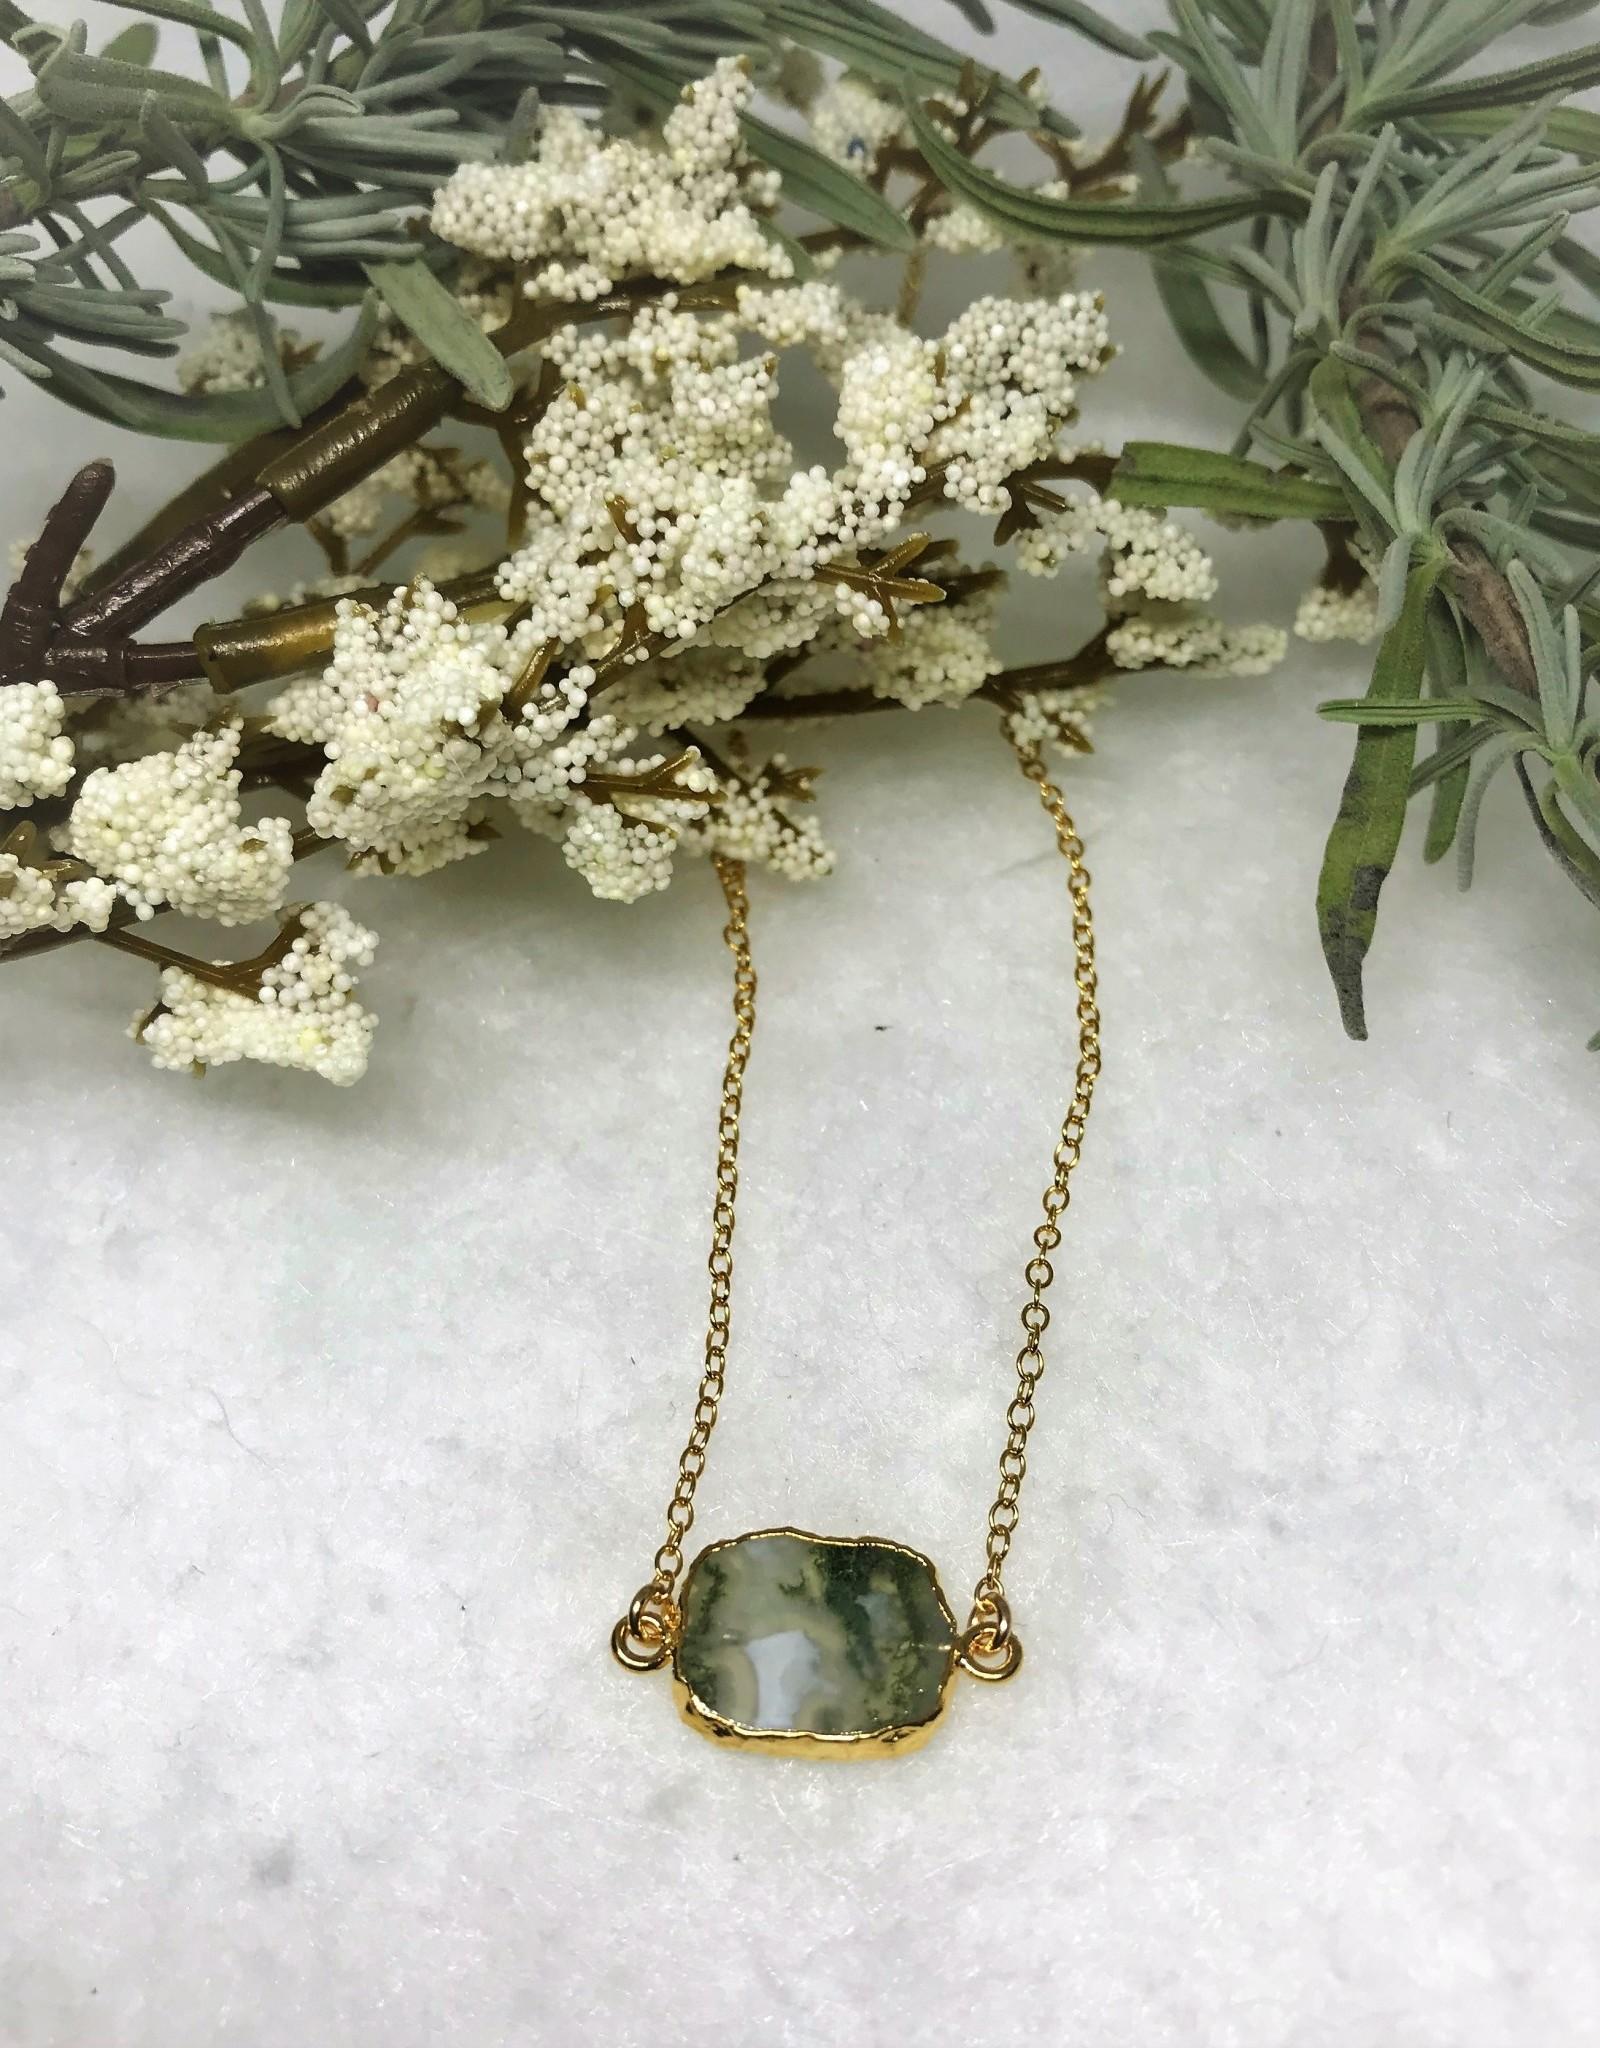 Gemstone Slice Necklace - Moss Quartz